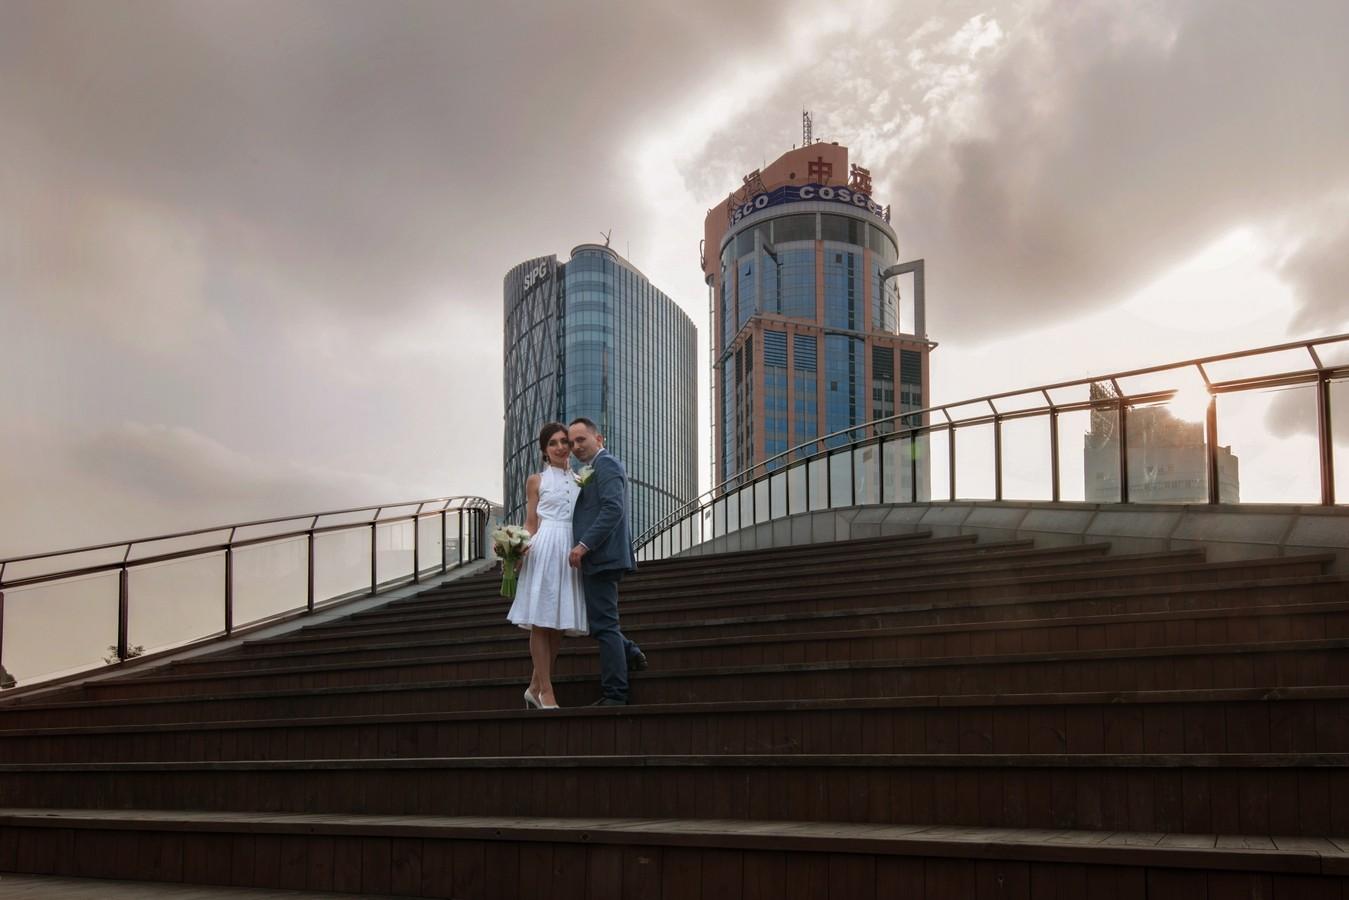 фотограф в Шанхае, Лиза Кирина фотограф,  Елизавета Кирина фотограф, свадебная съемка, съемка свадеб,,  Liza Kirina photographer, photographer in Shanghai, Elizaveta Kirina photographer, wedding photo, wedding photo shooting